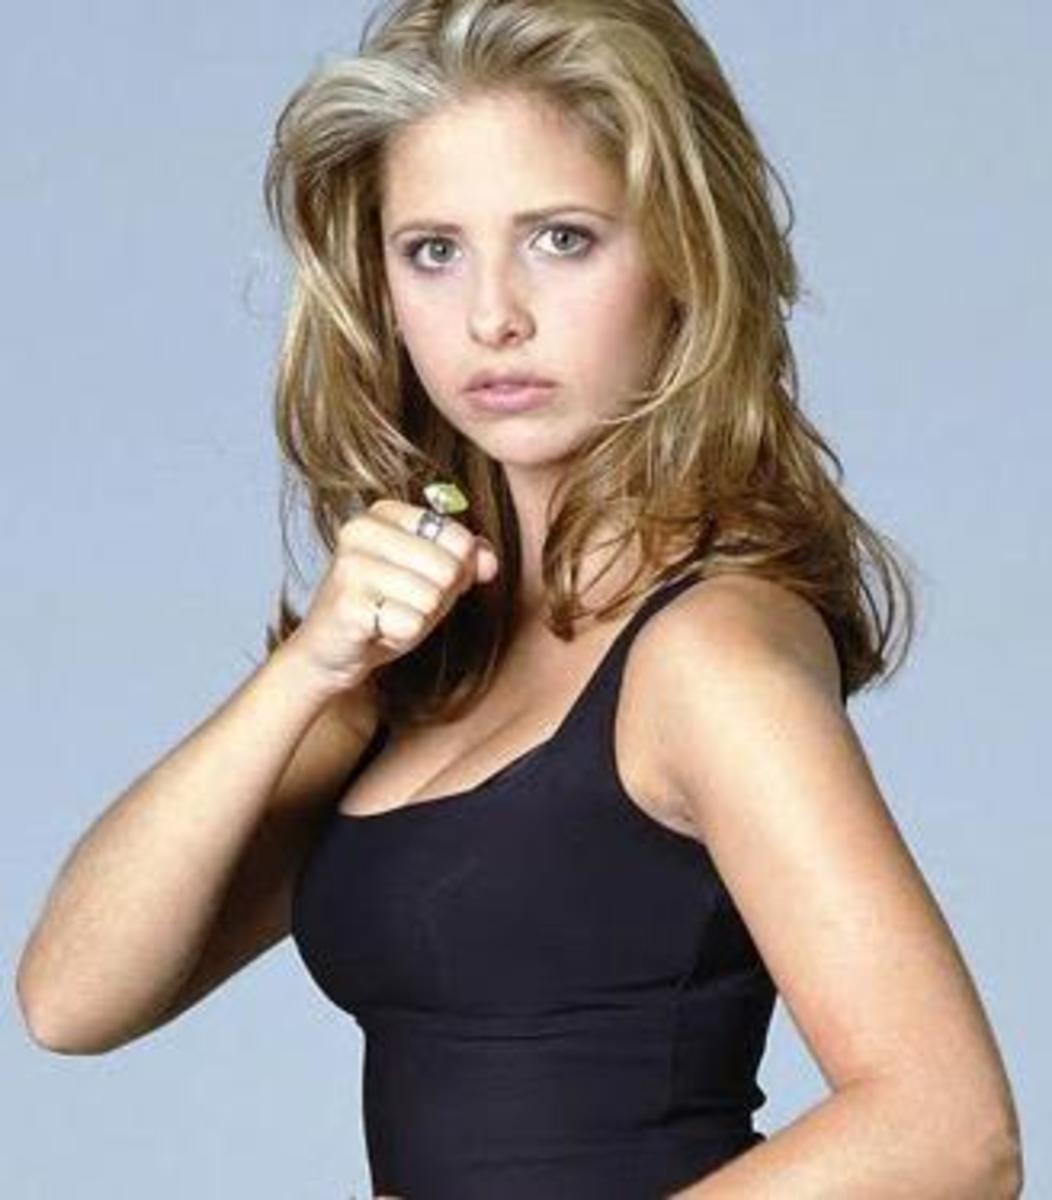 5-actresses-who-kick-butt-and-take-names